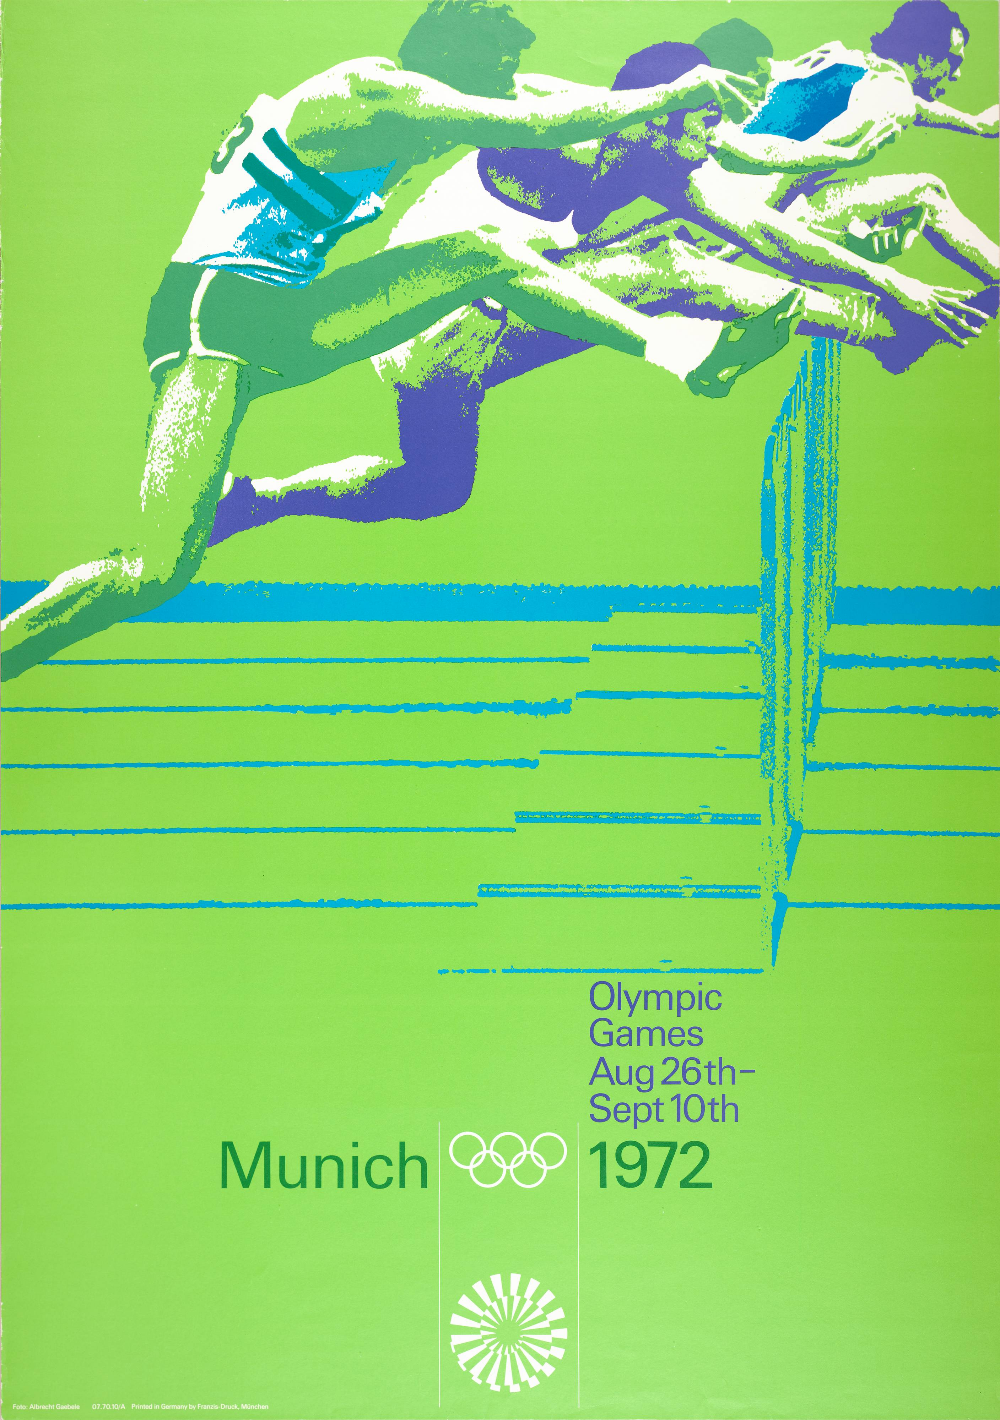 1972 Munich Olympics Hurdles Poster Sports Series Sfmoma Otl Aicher Munich Olympics